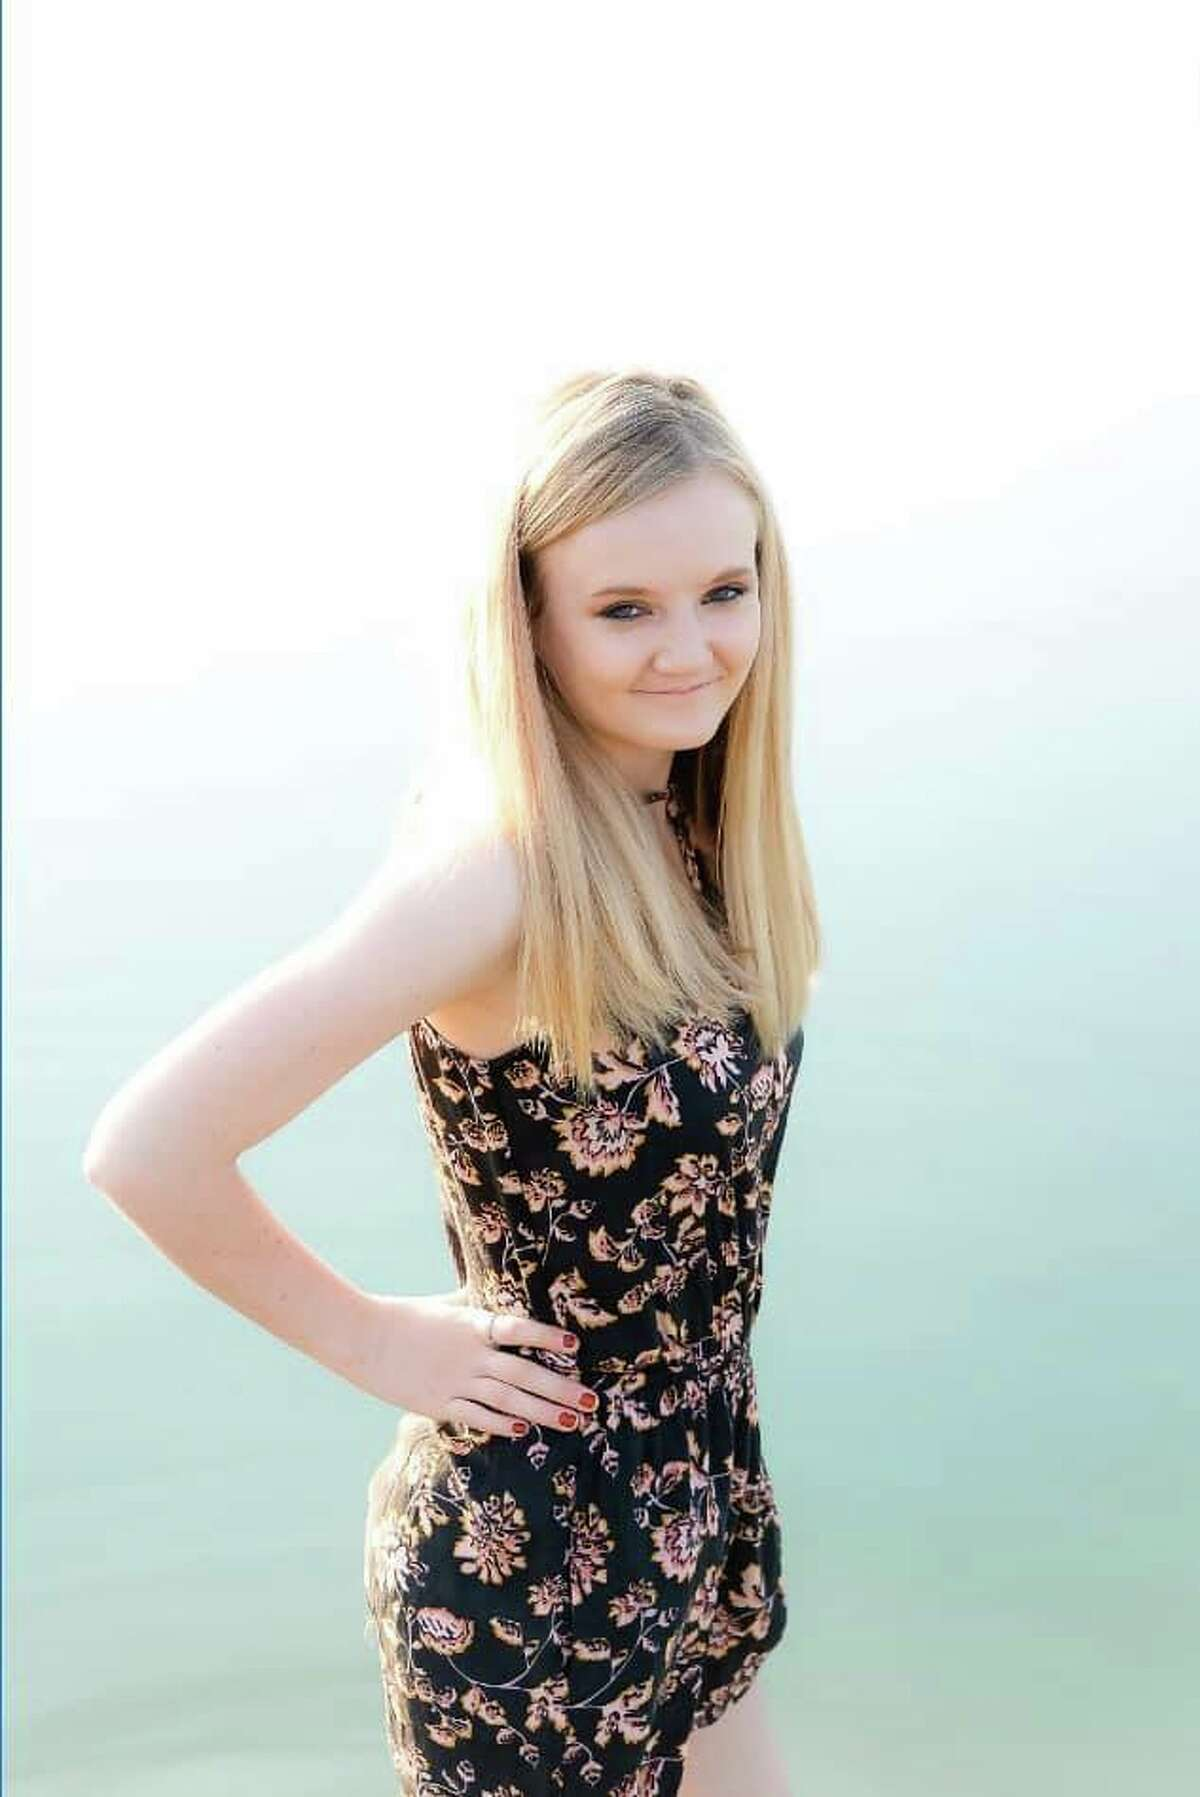 Haley Schember - Bad Axe High School